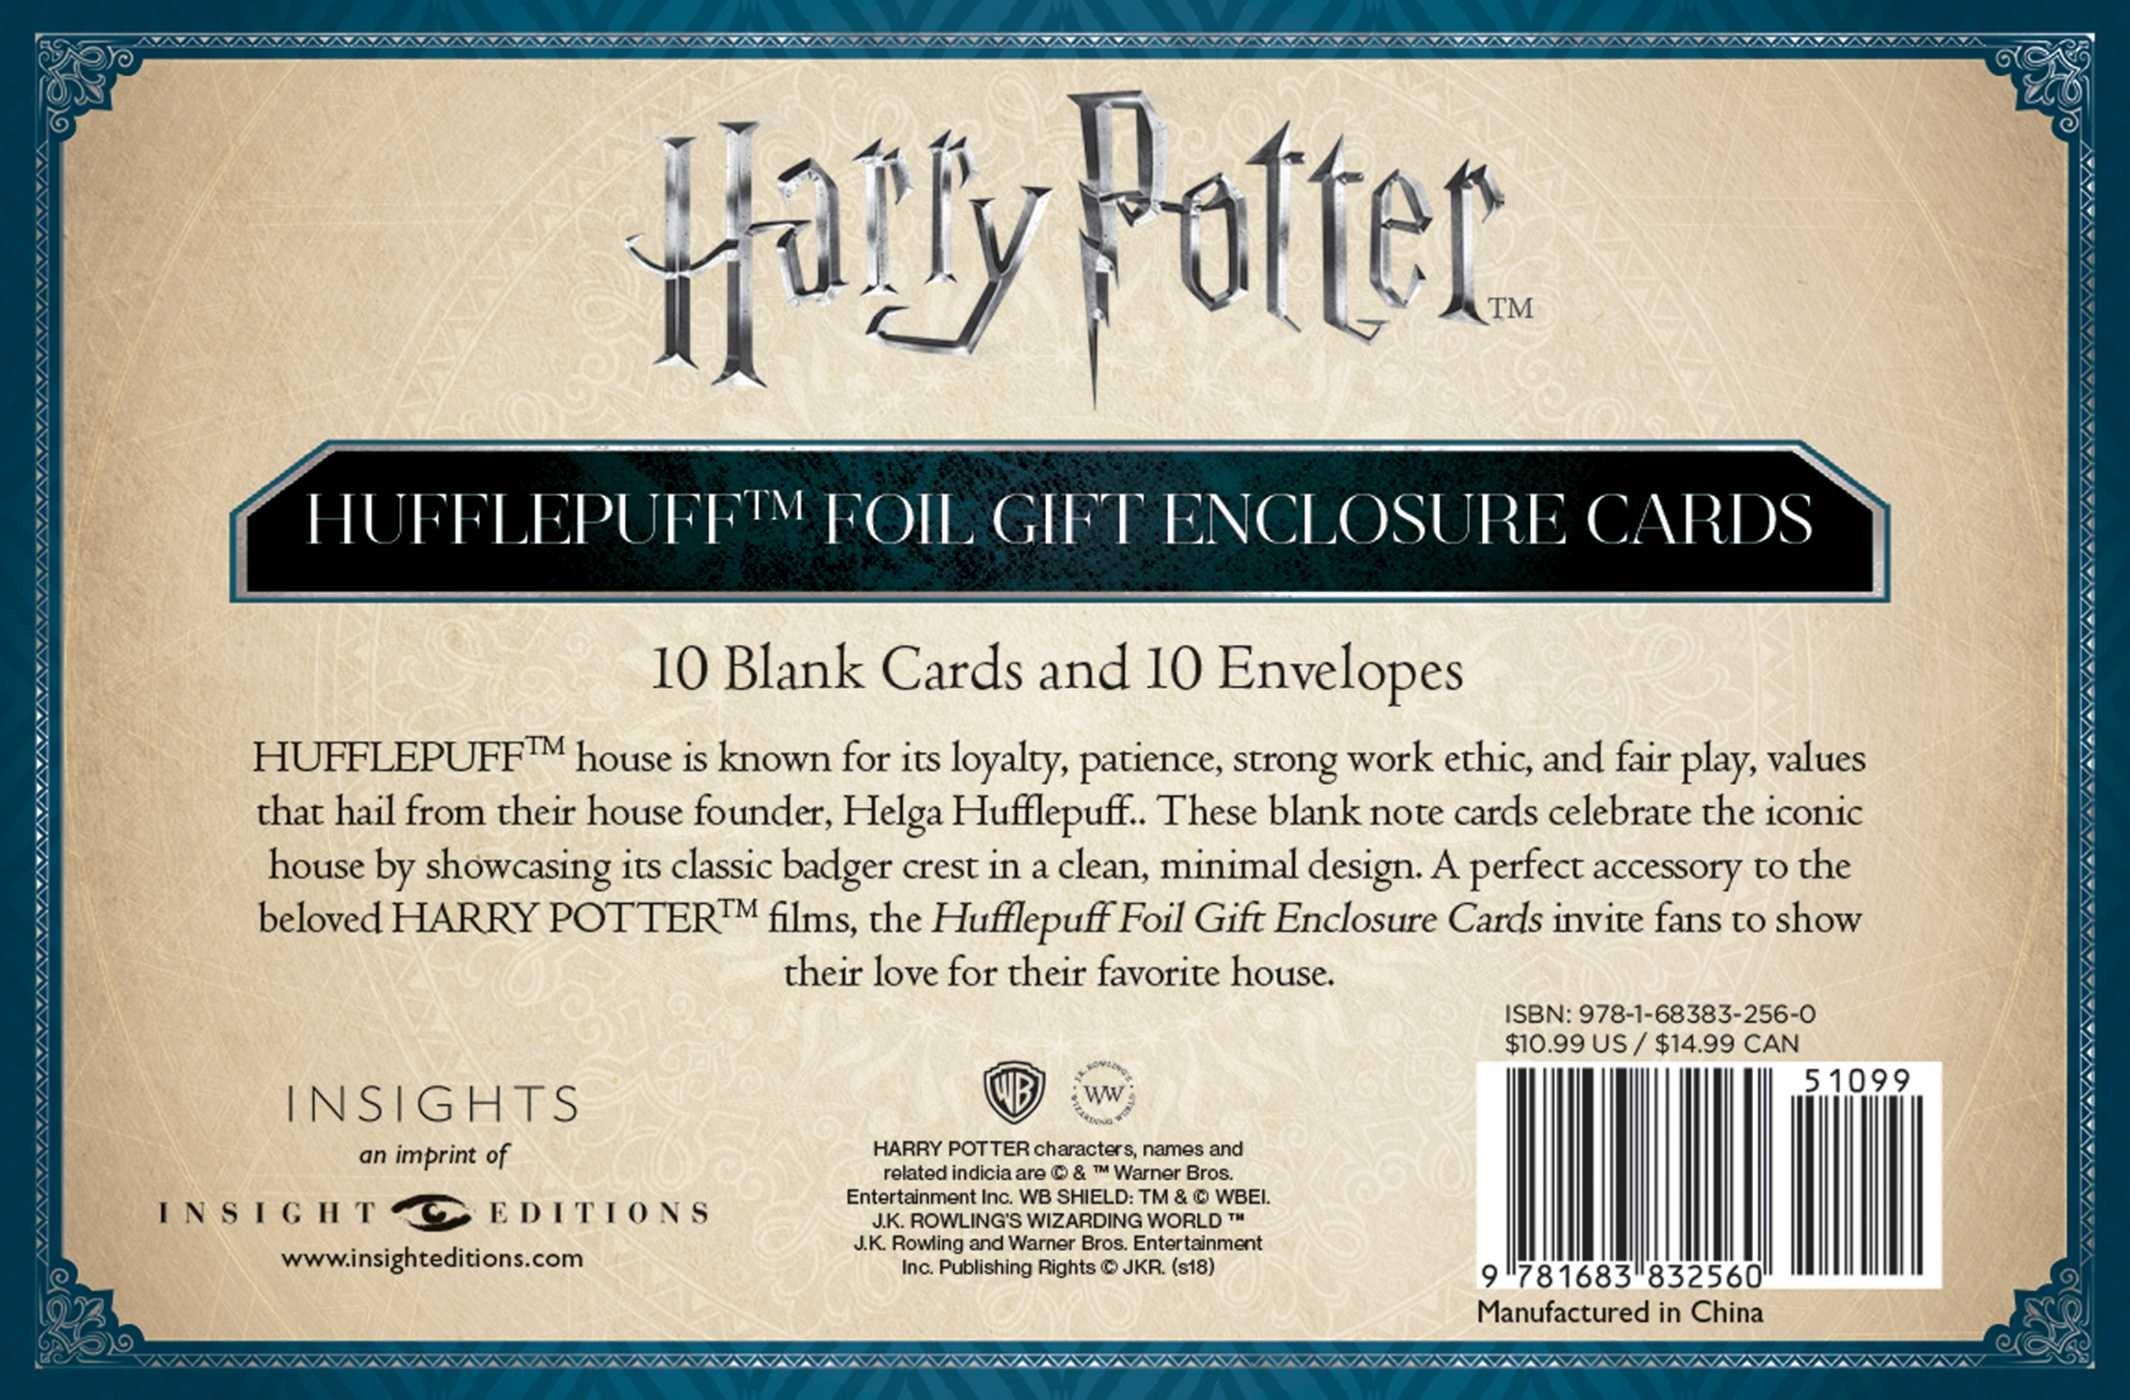 Harry potter hufflepuff crest foil gift enclosure cards set of 10 9781683832560.in02